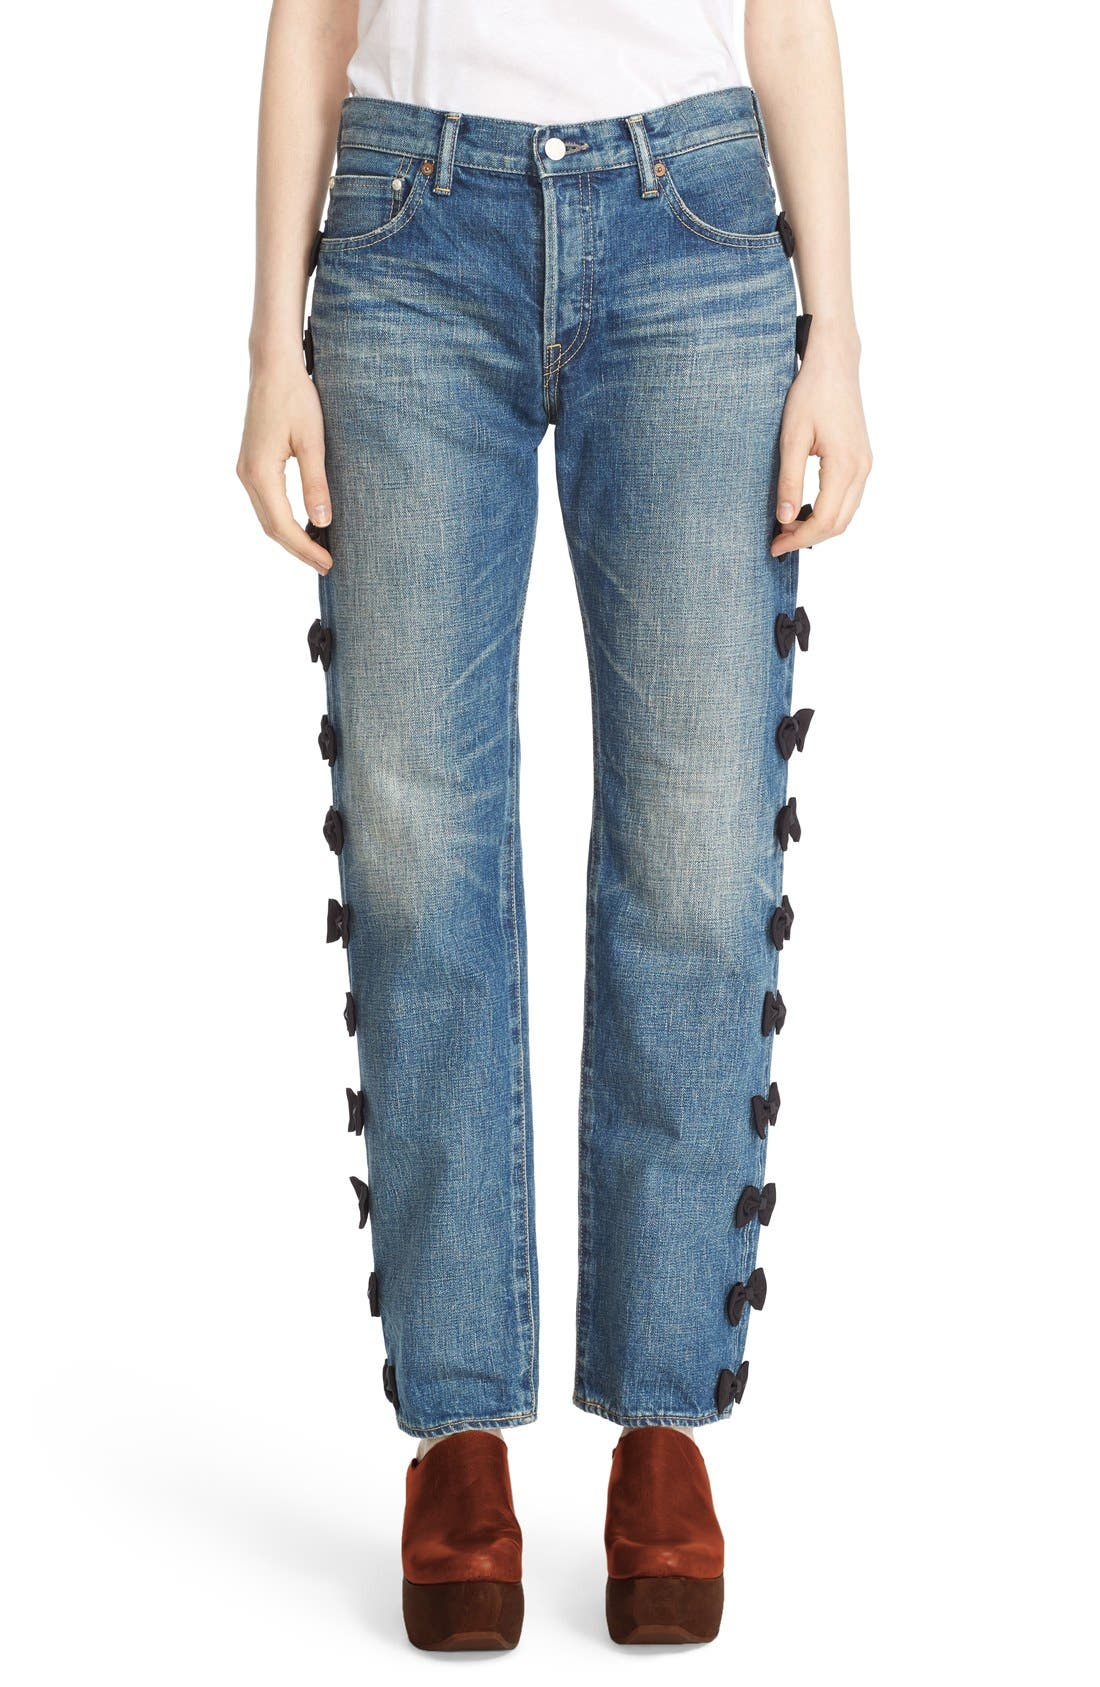 TU ES MON TRÉSOR Grosgrain Bow Embellished Jeans